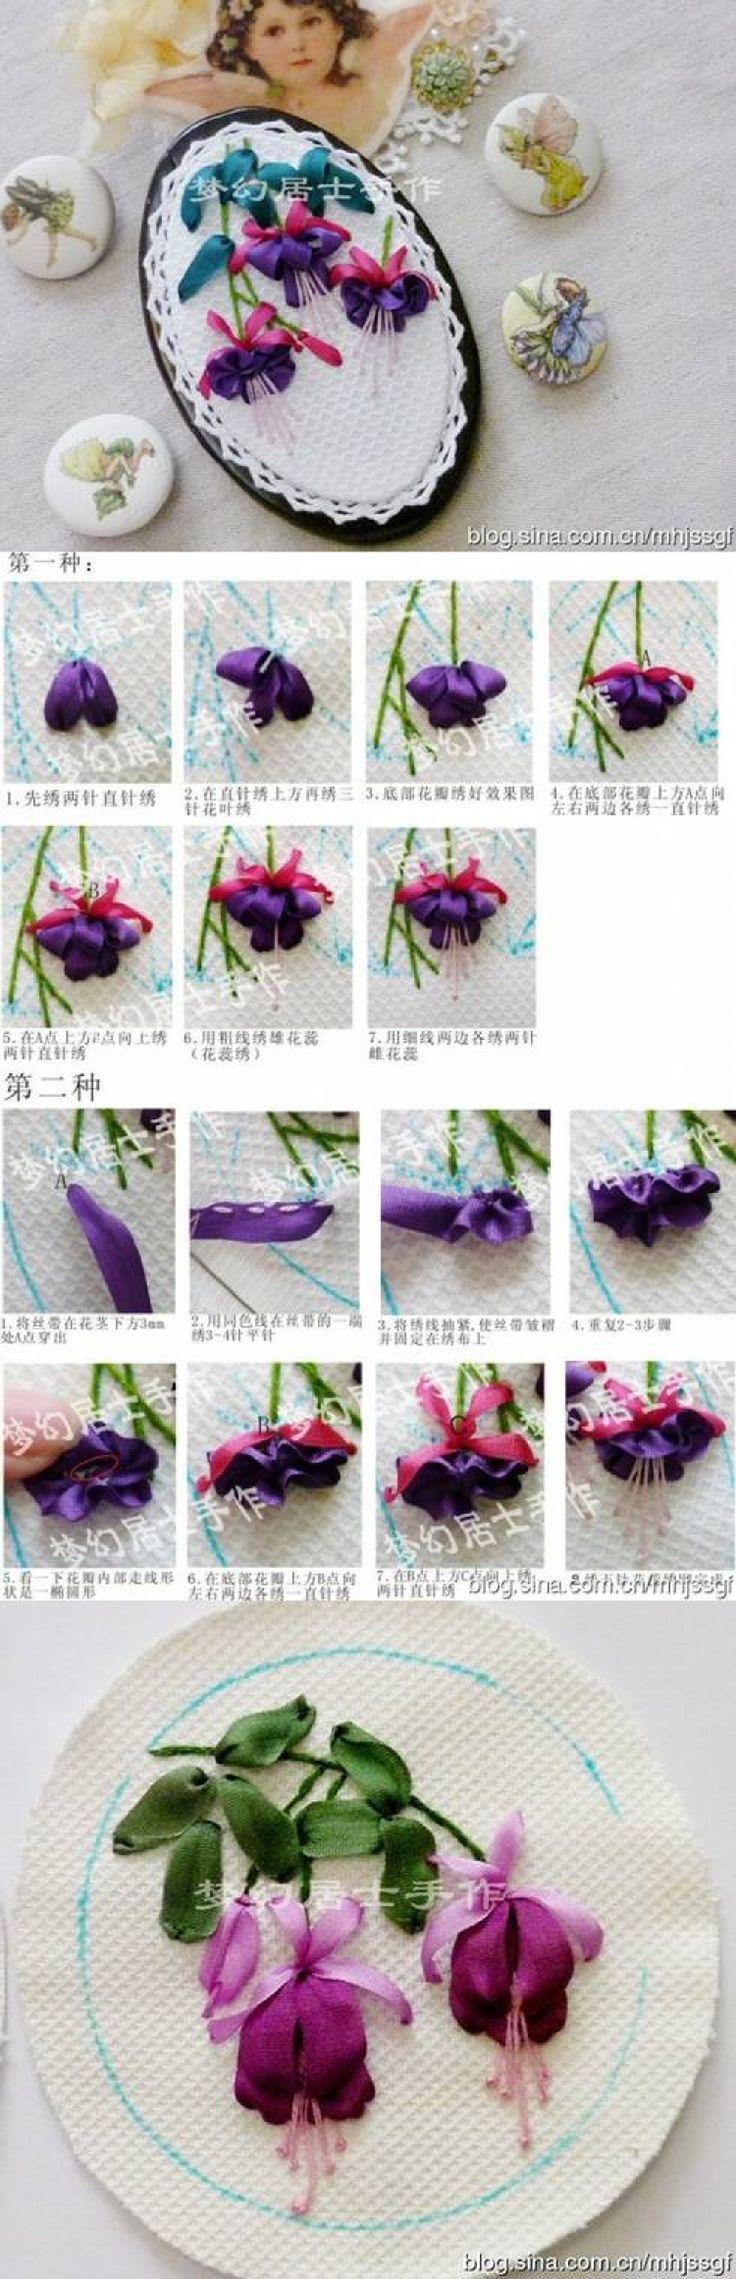 Ribbon embroidery bedspread designs - I Ribbon Embroidery Diy Hand Ribbon Embroidery